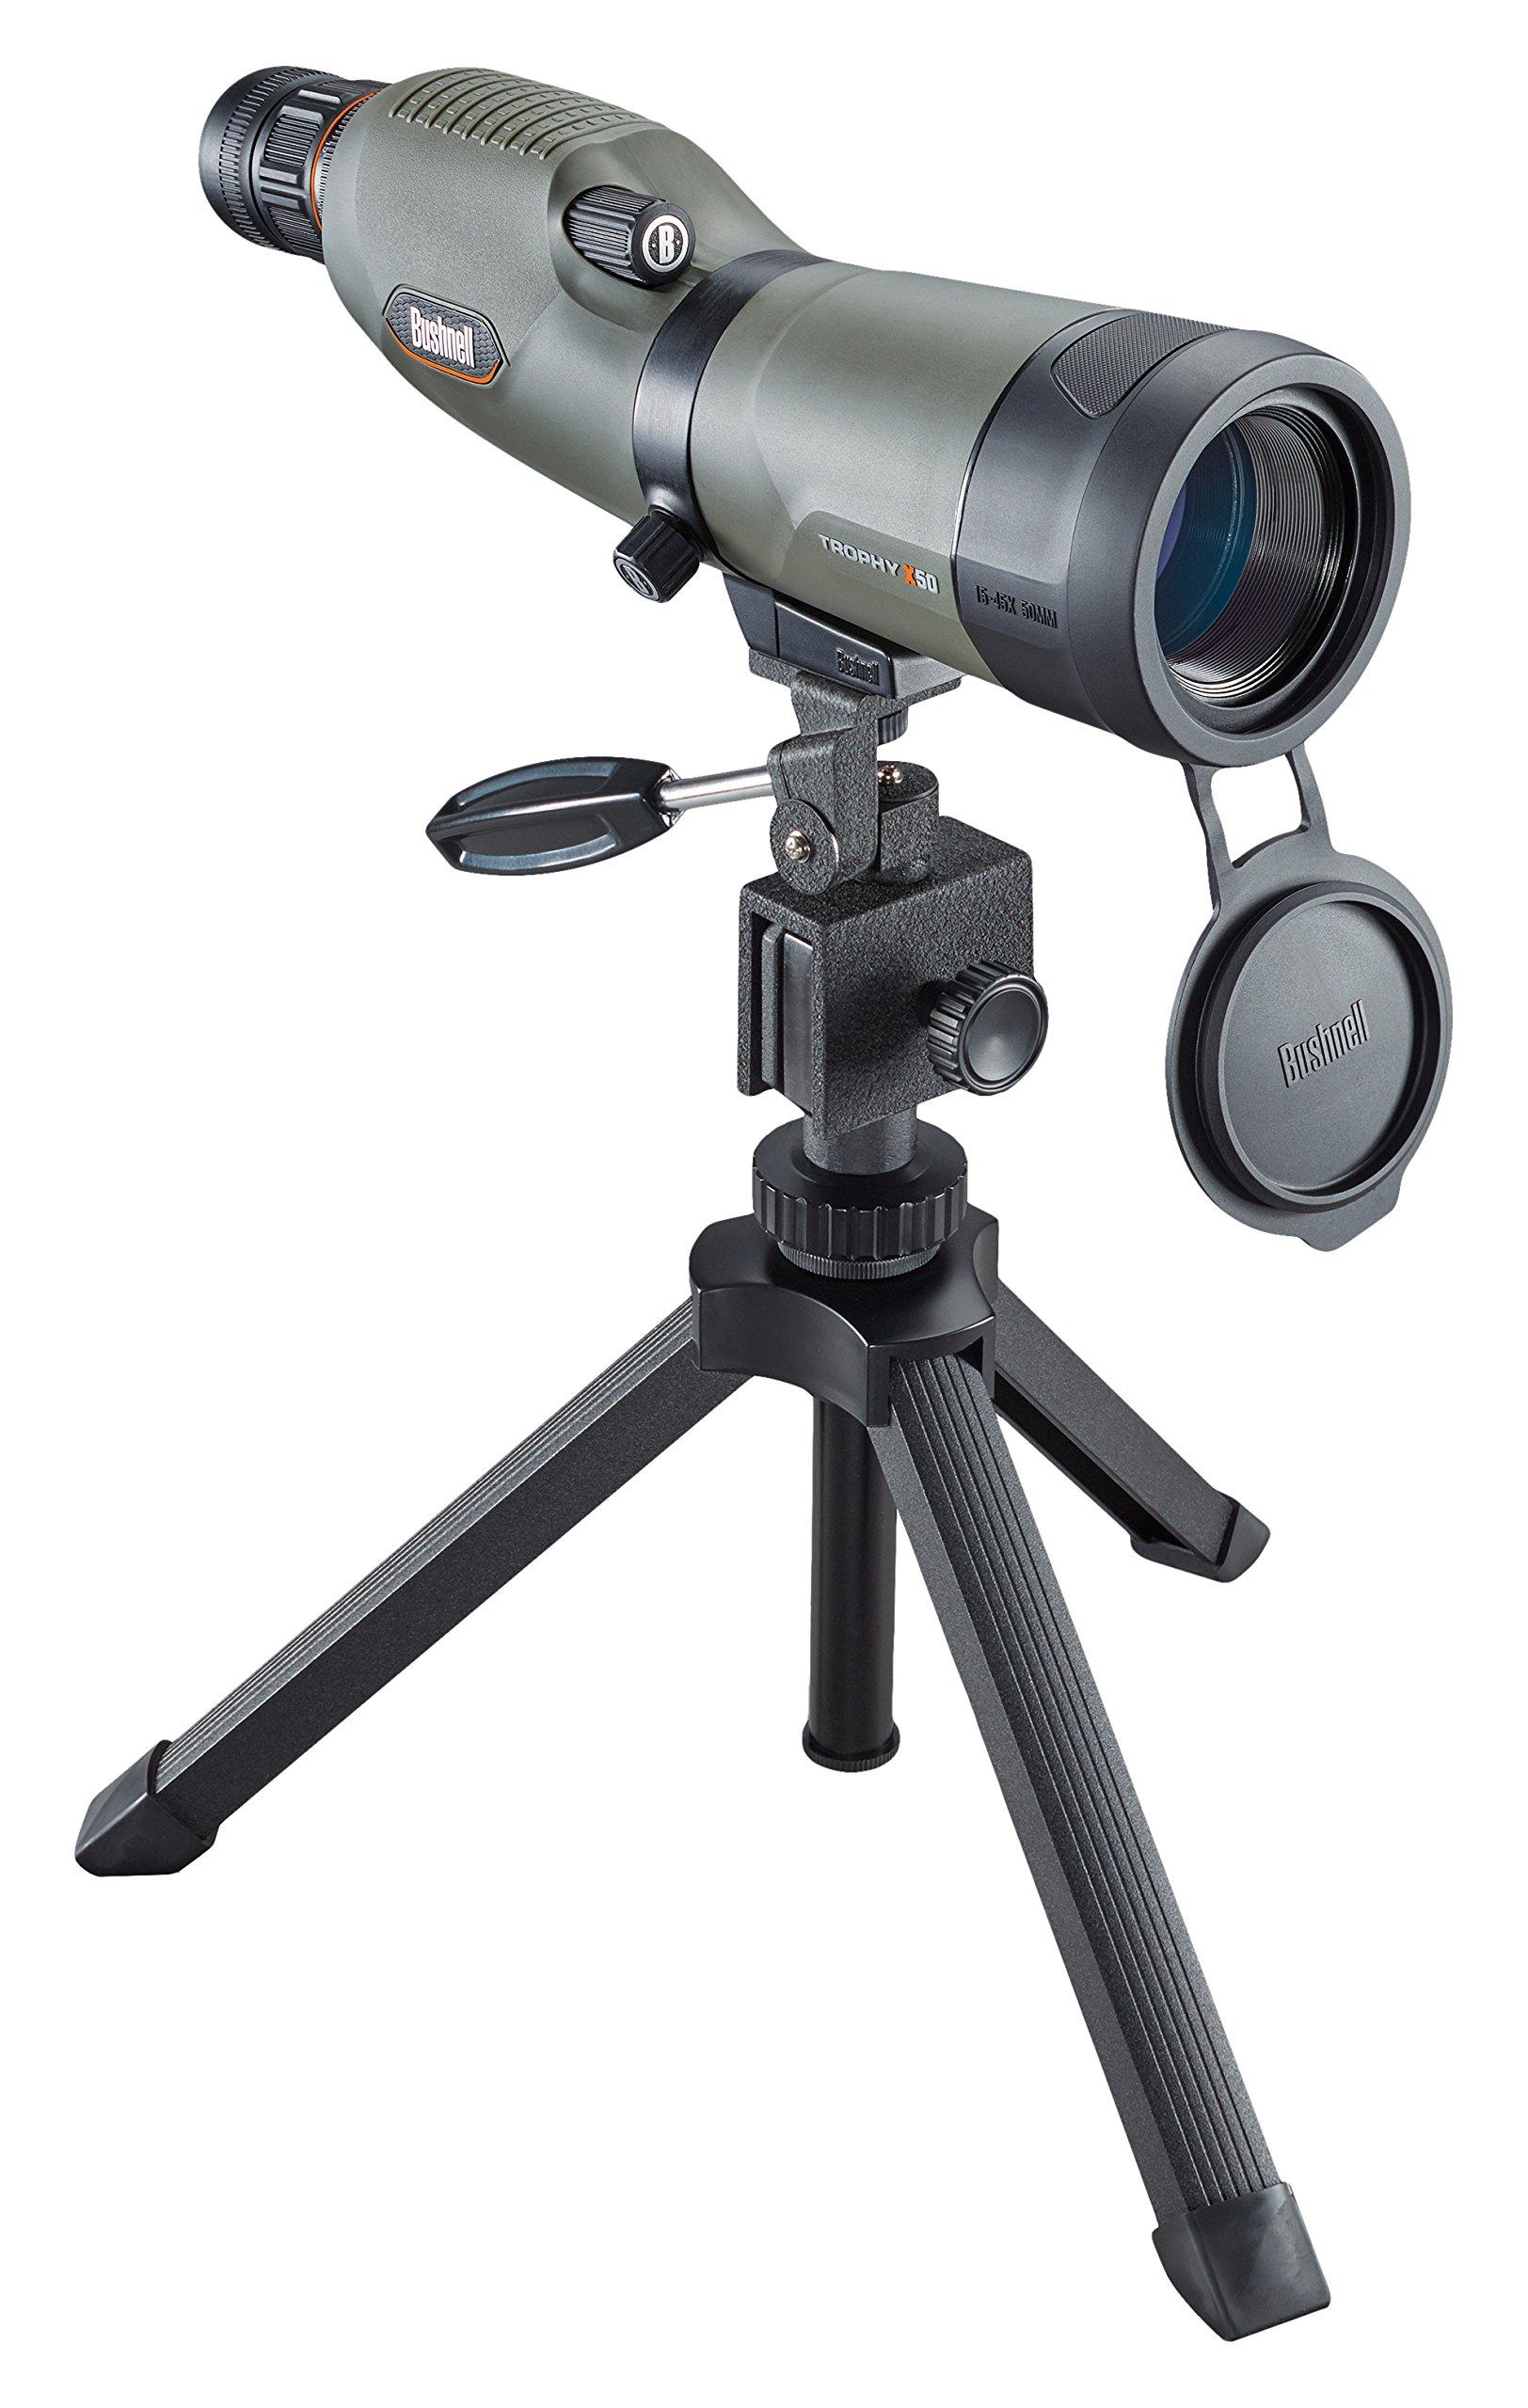 Bushnell Trophy Xtreme Spotting Scope, Green, 20-60 x 65mm by Bushnell